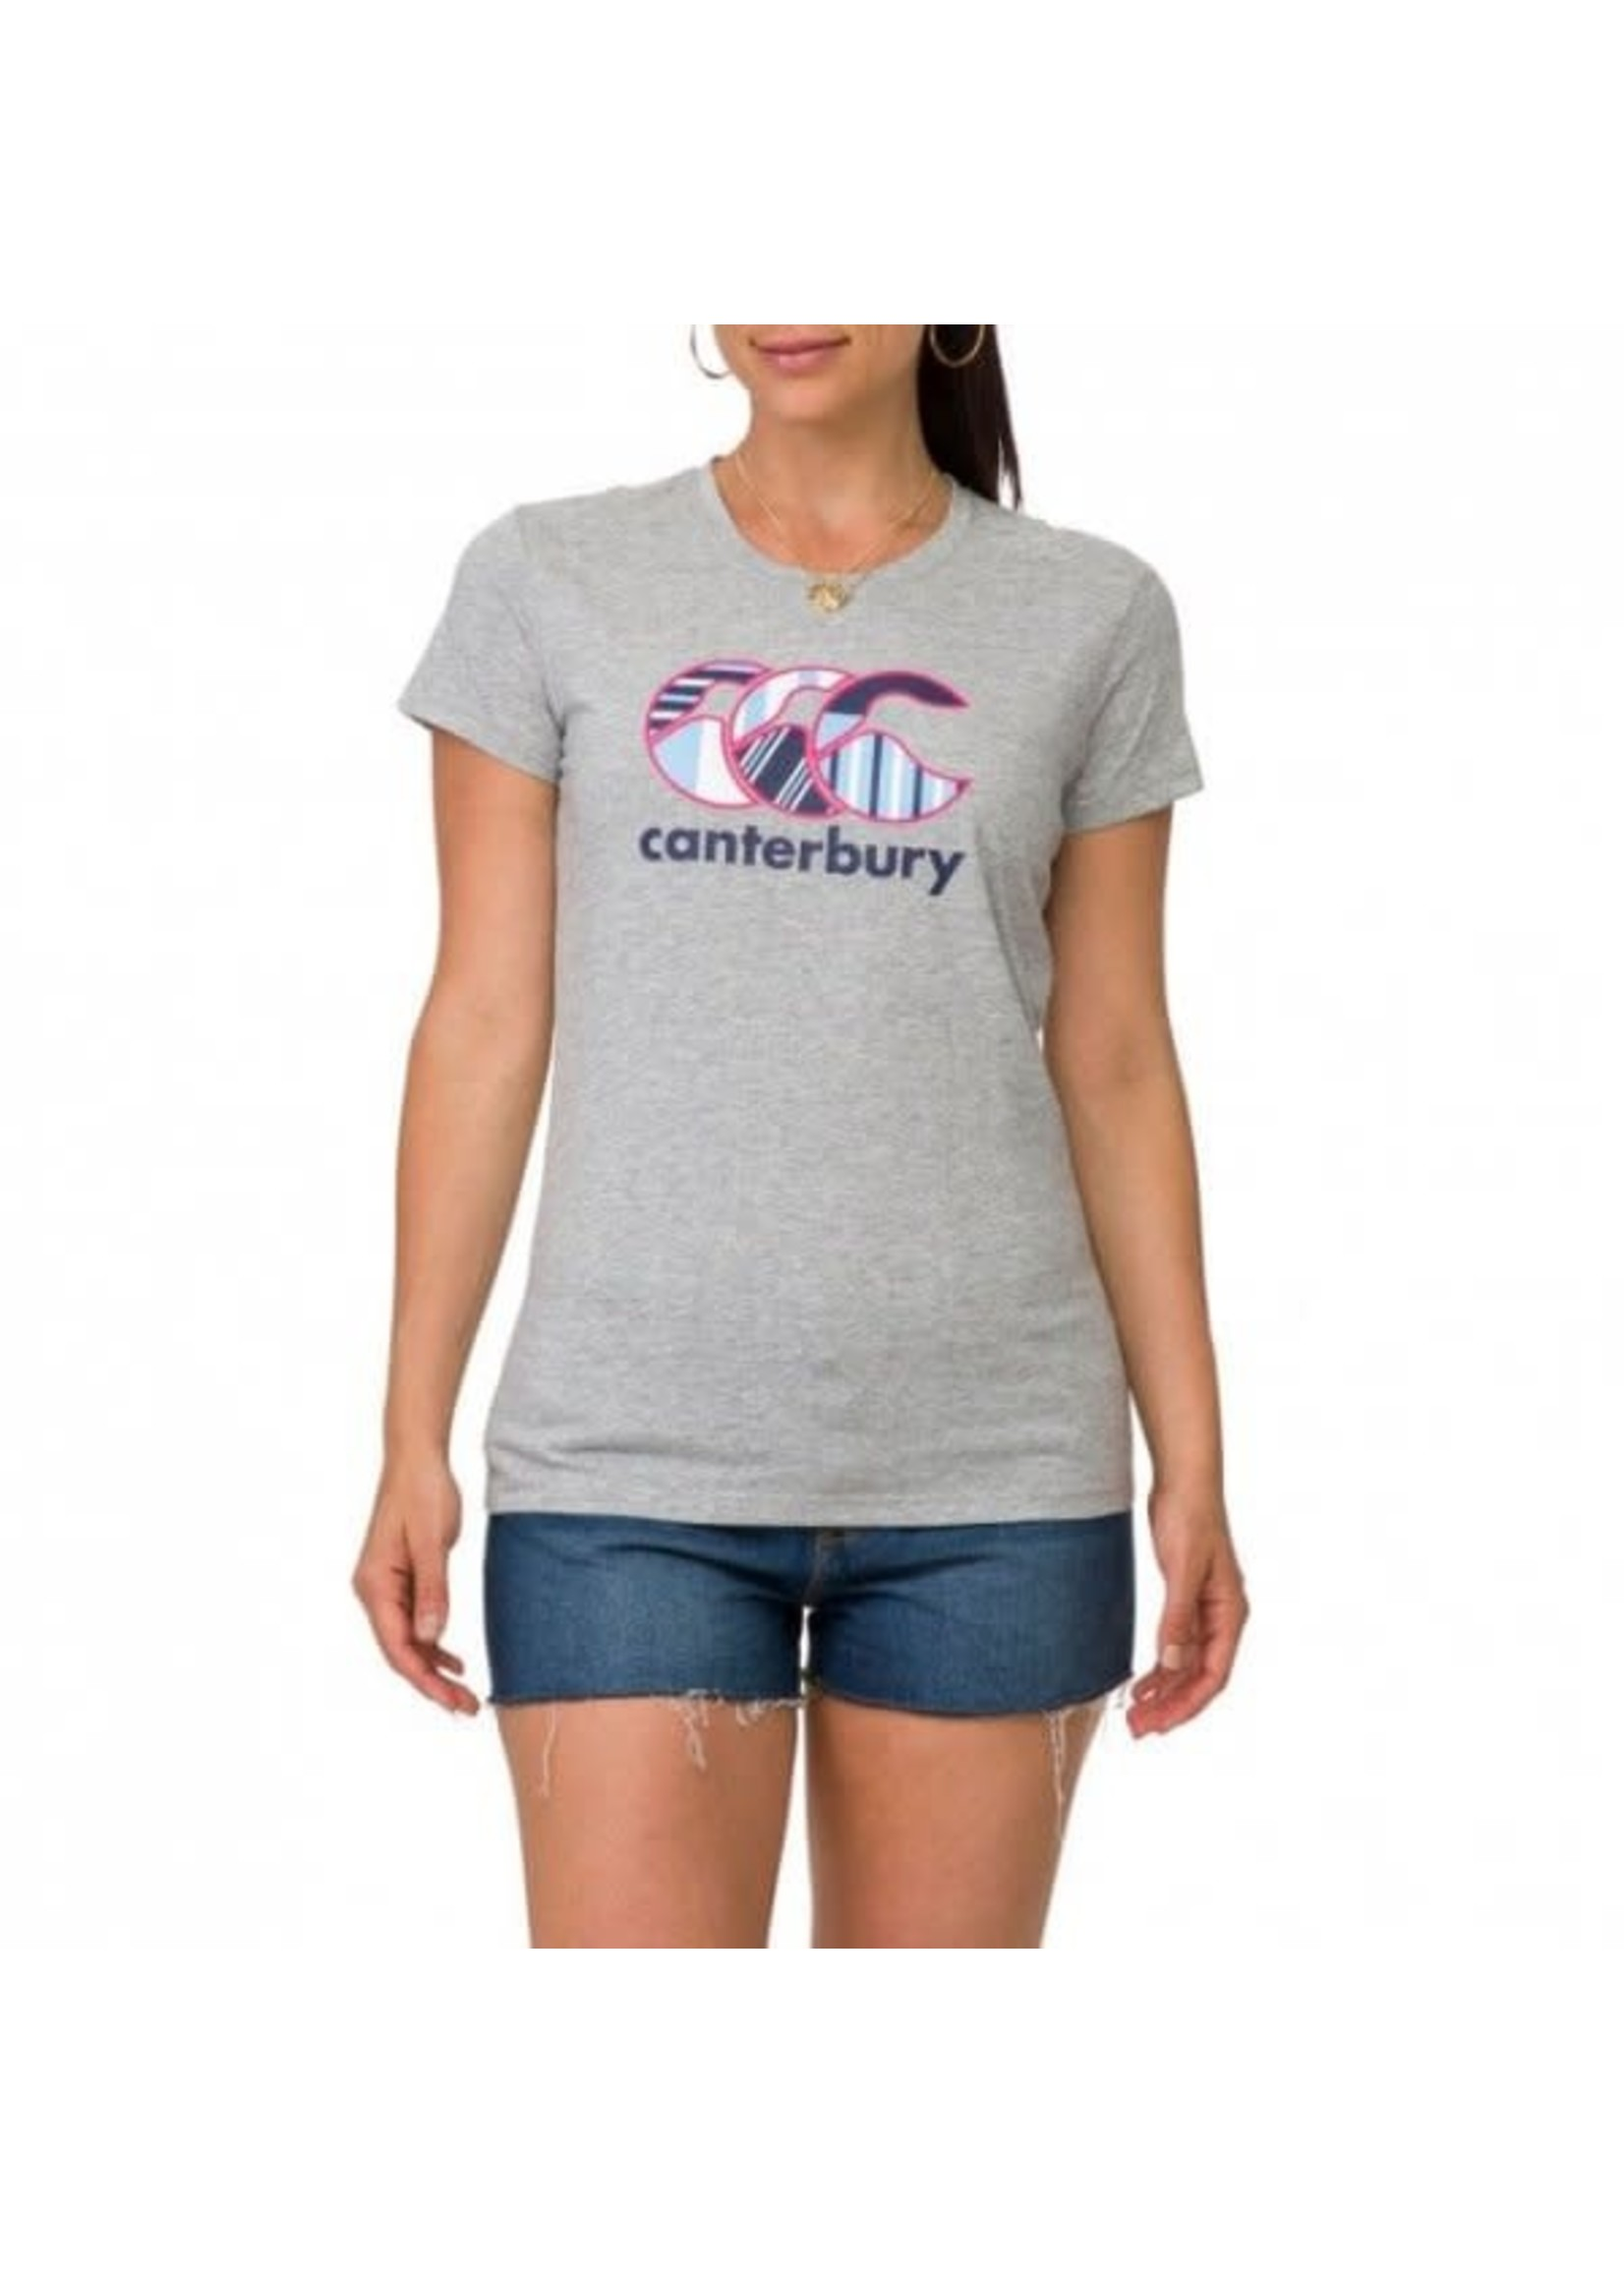 Canterbury Canterbury Ladies Uglies Tee (2020/21) Grey/Pink/Navy/Lime